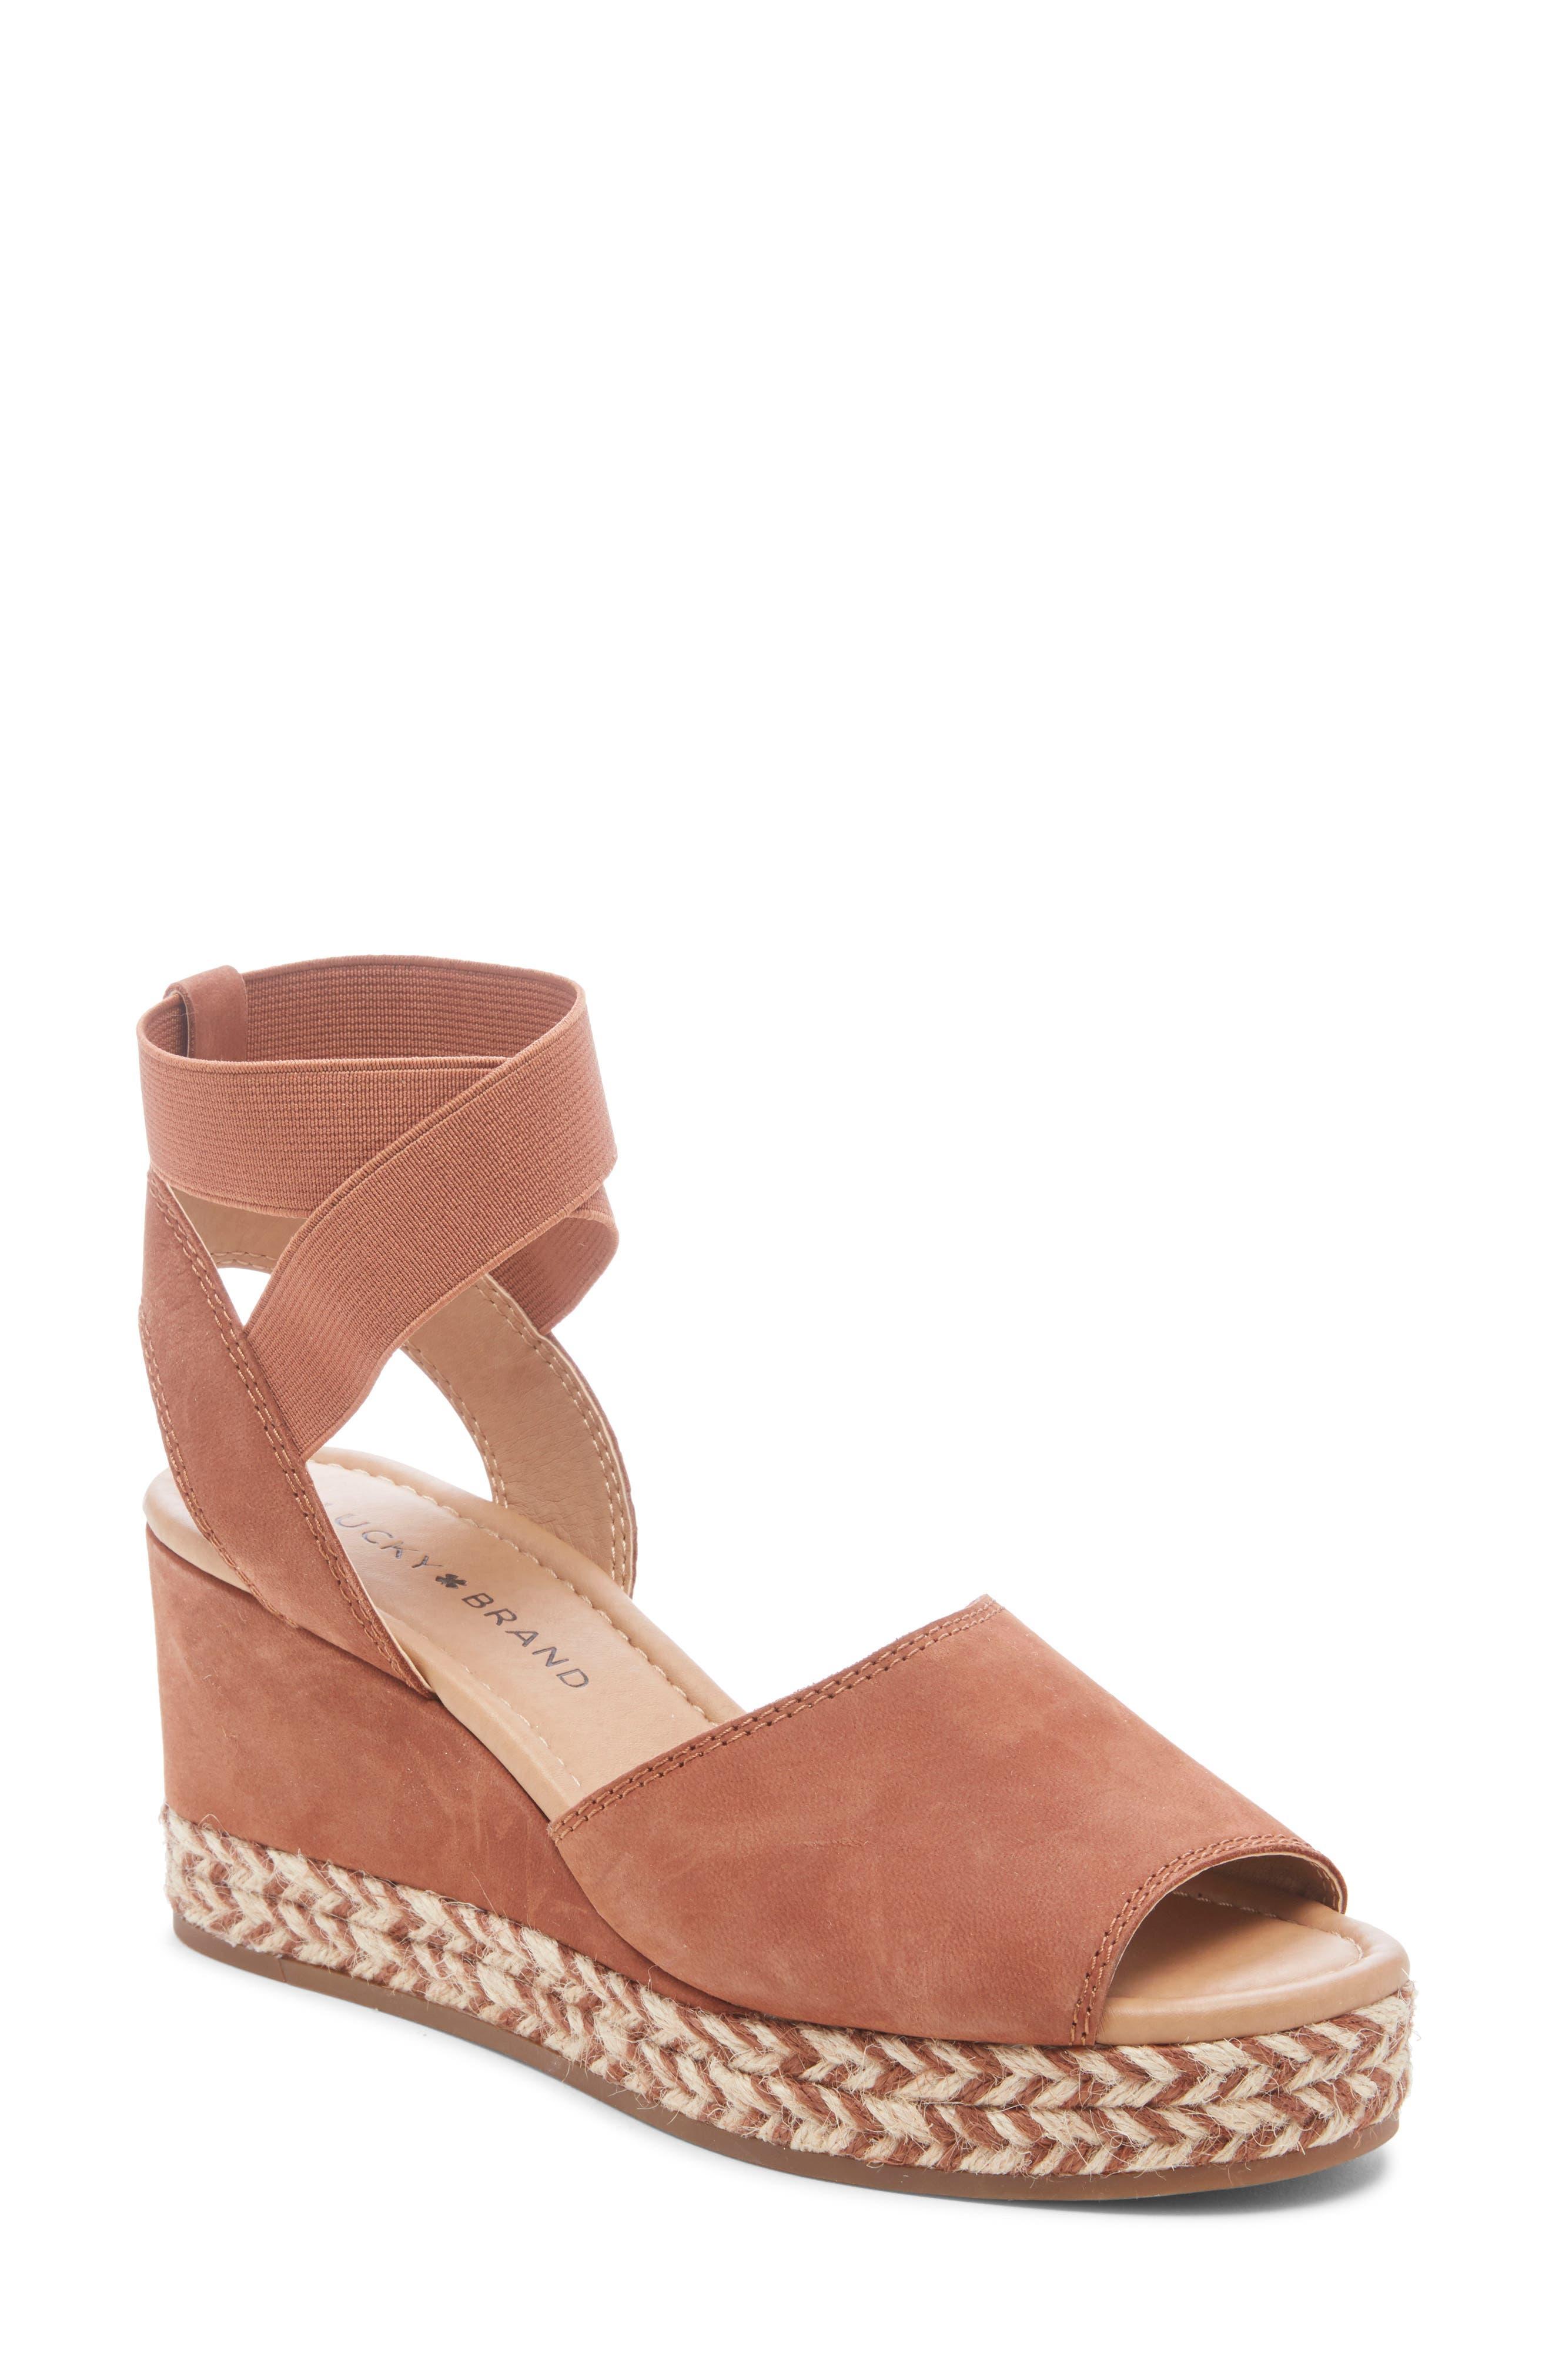 Lucky Brand Bettanie Espadrille Wedge Sandal, Brown